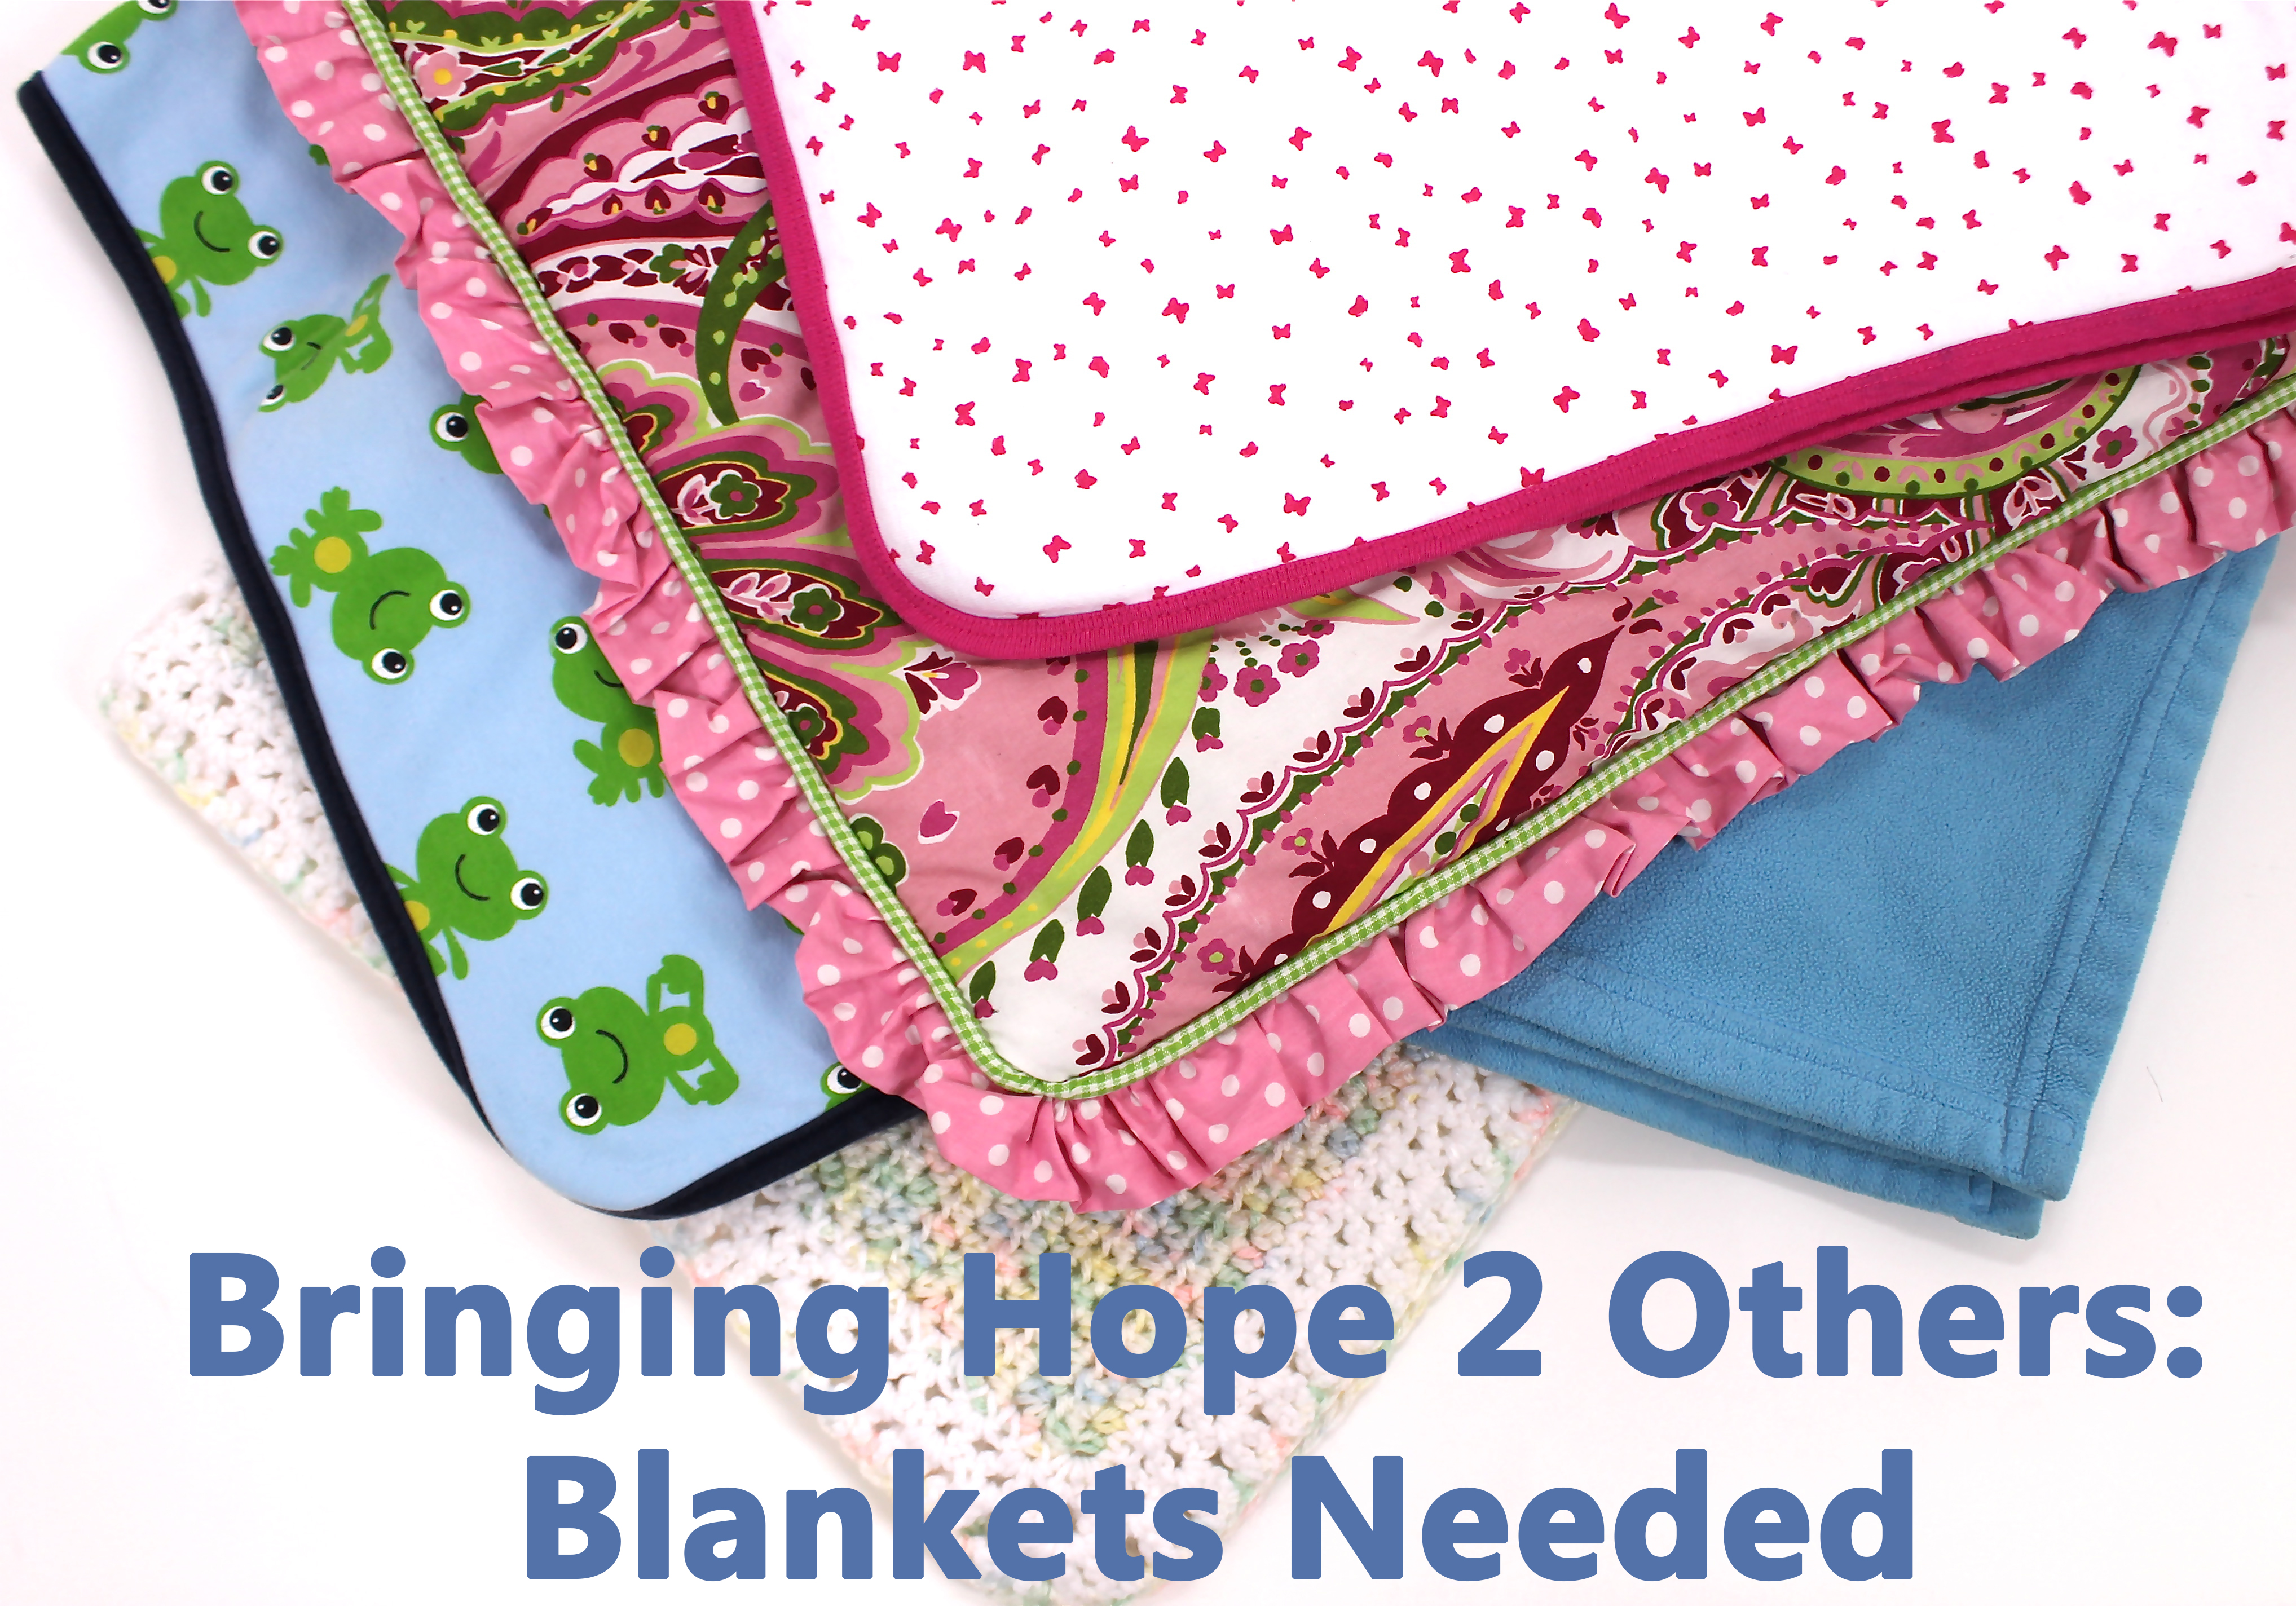 BlanketsNeeded 1